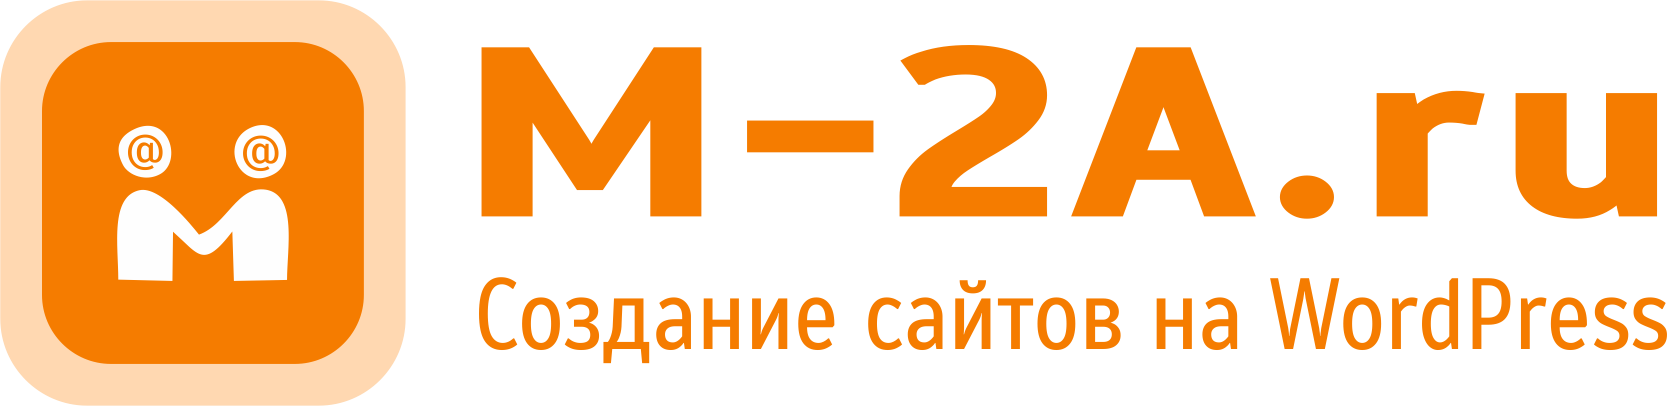 M2A - создание и продвижение сайтов на WordPress